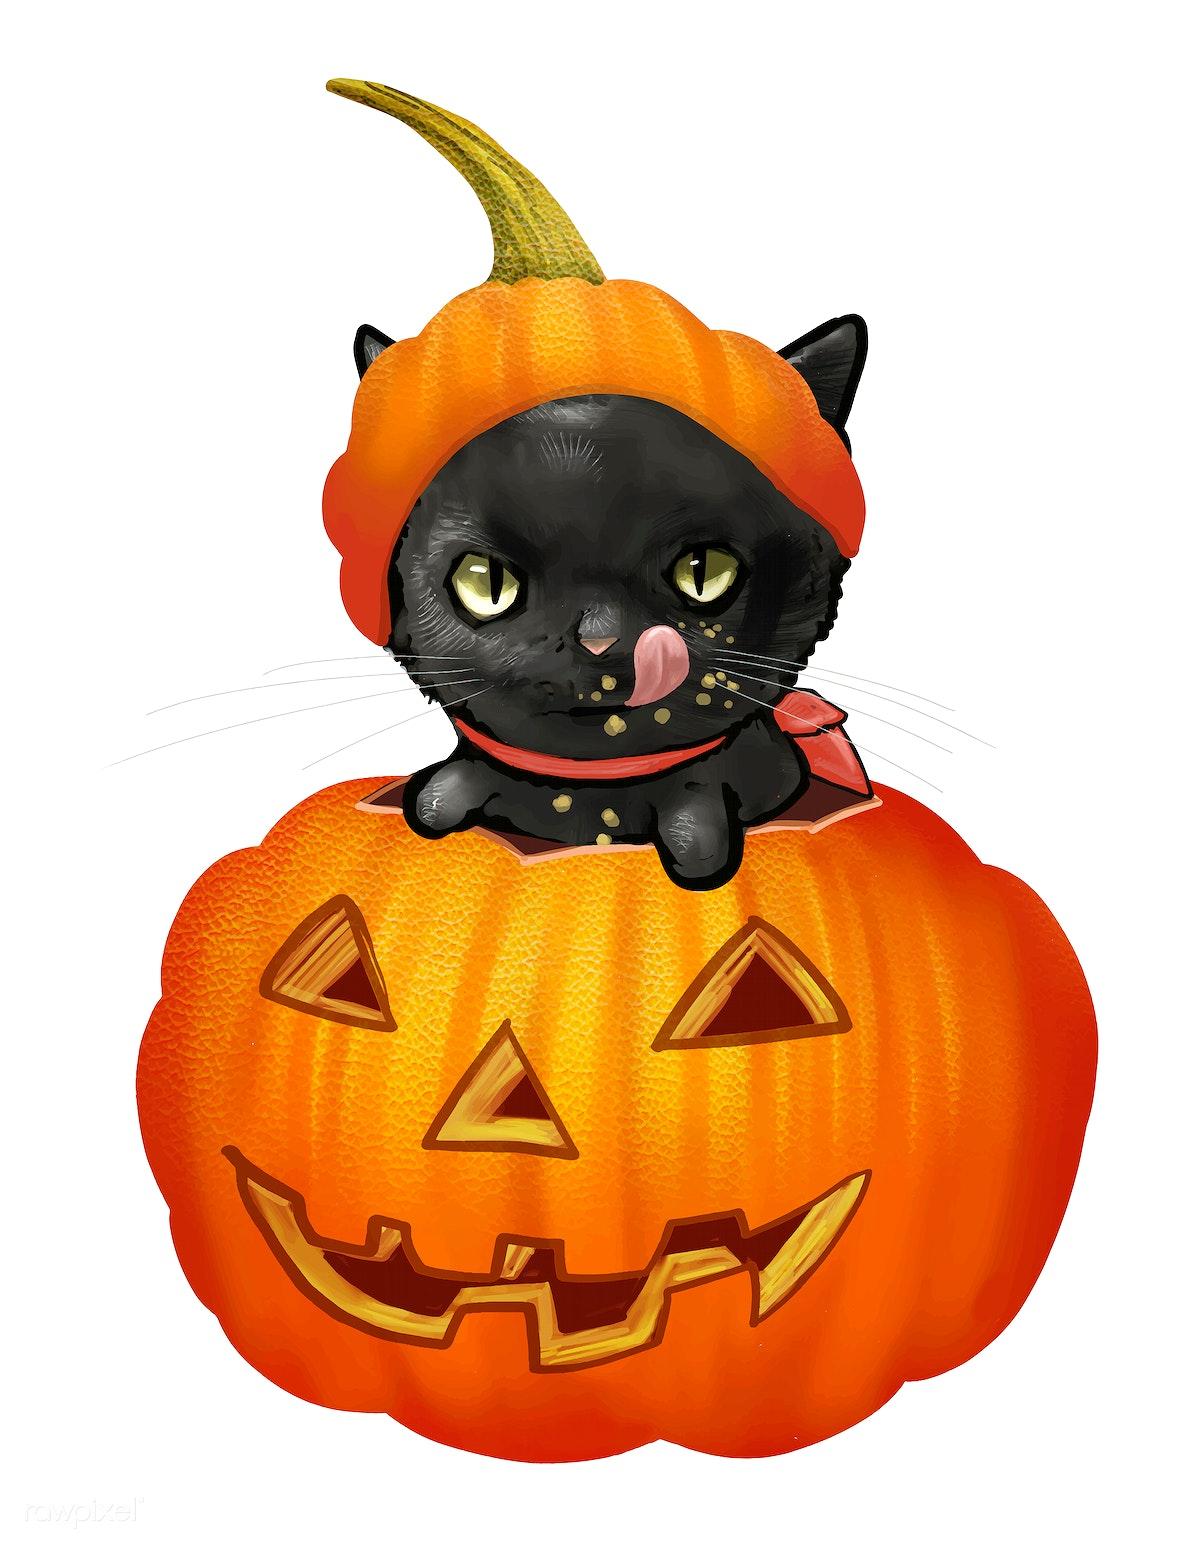 Halloween Pumpkin Vector.Illustration Of A Black Cat In Pumpkin Vector Free Stock